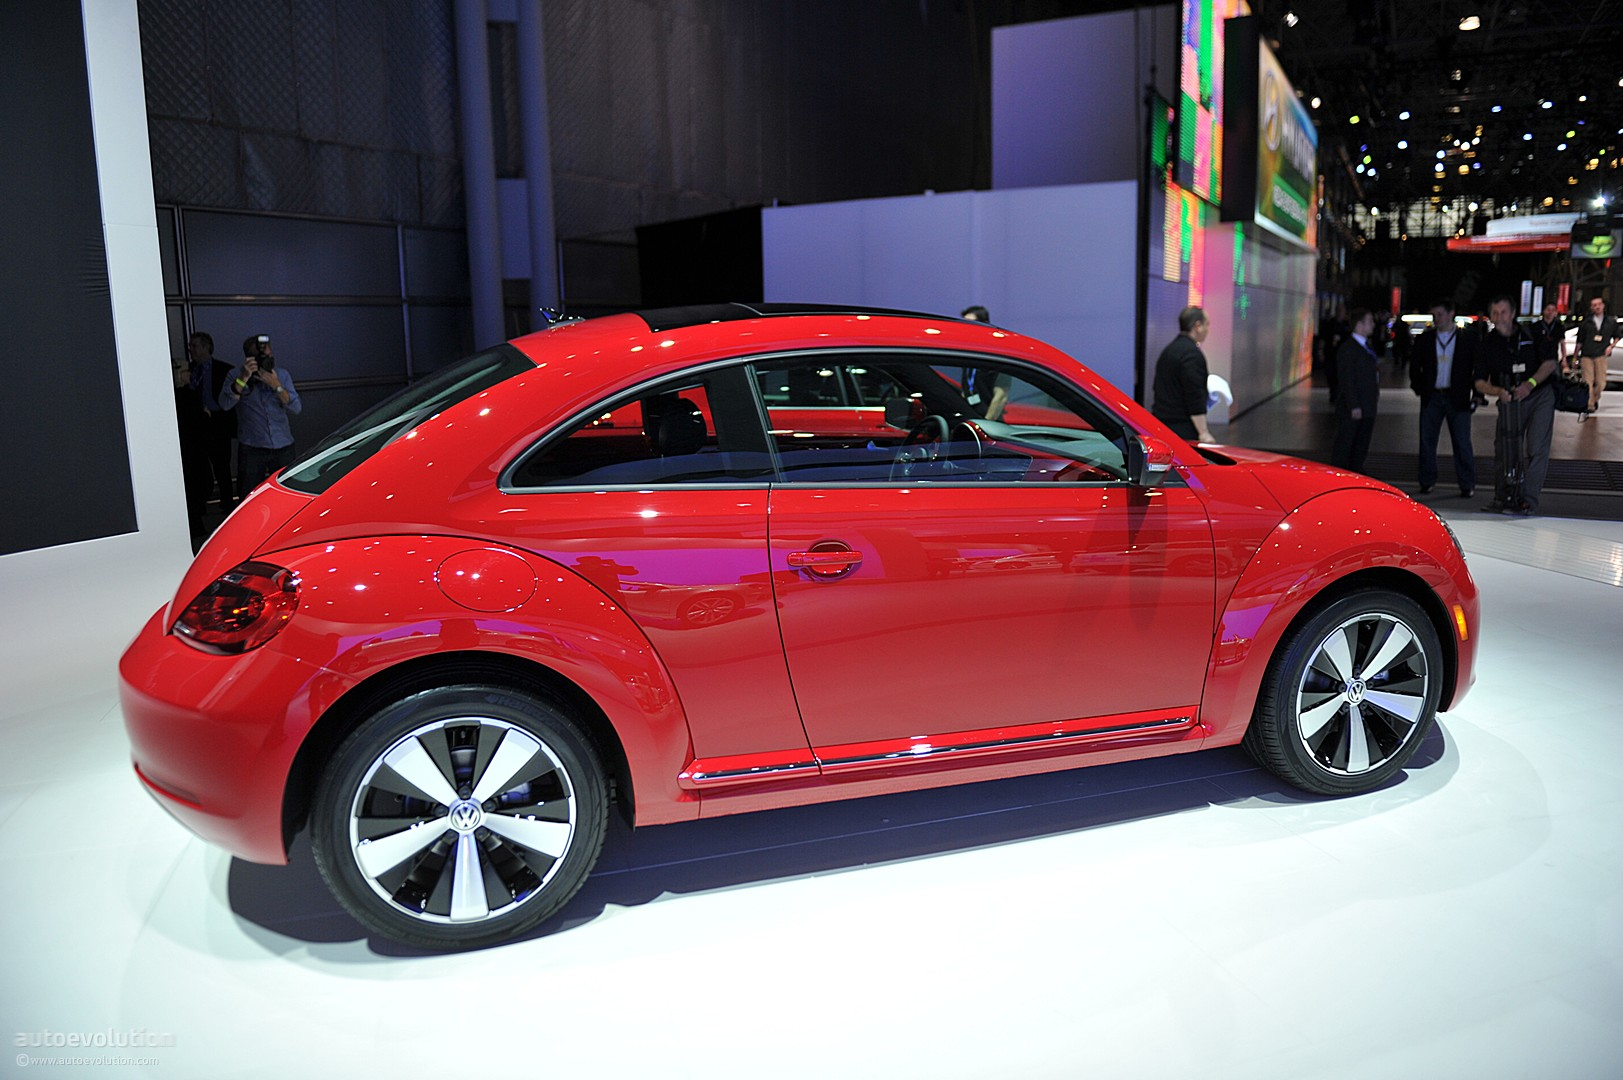 NYIAS 2011 Volkswagen Beetle Live Photos  autoevolution